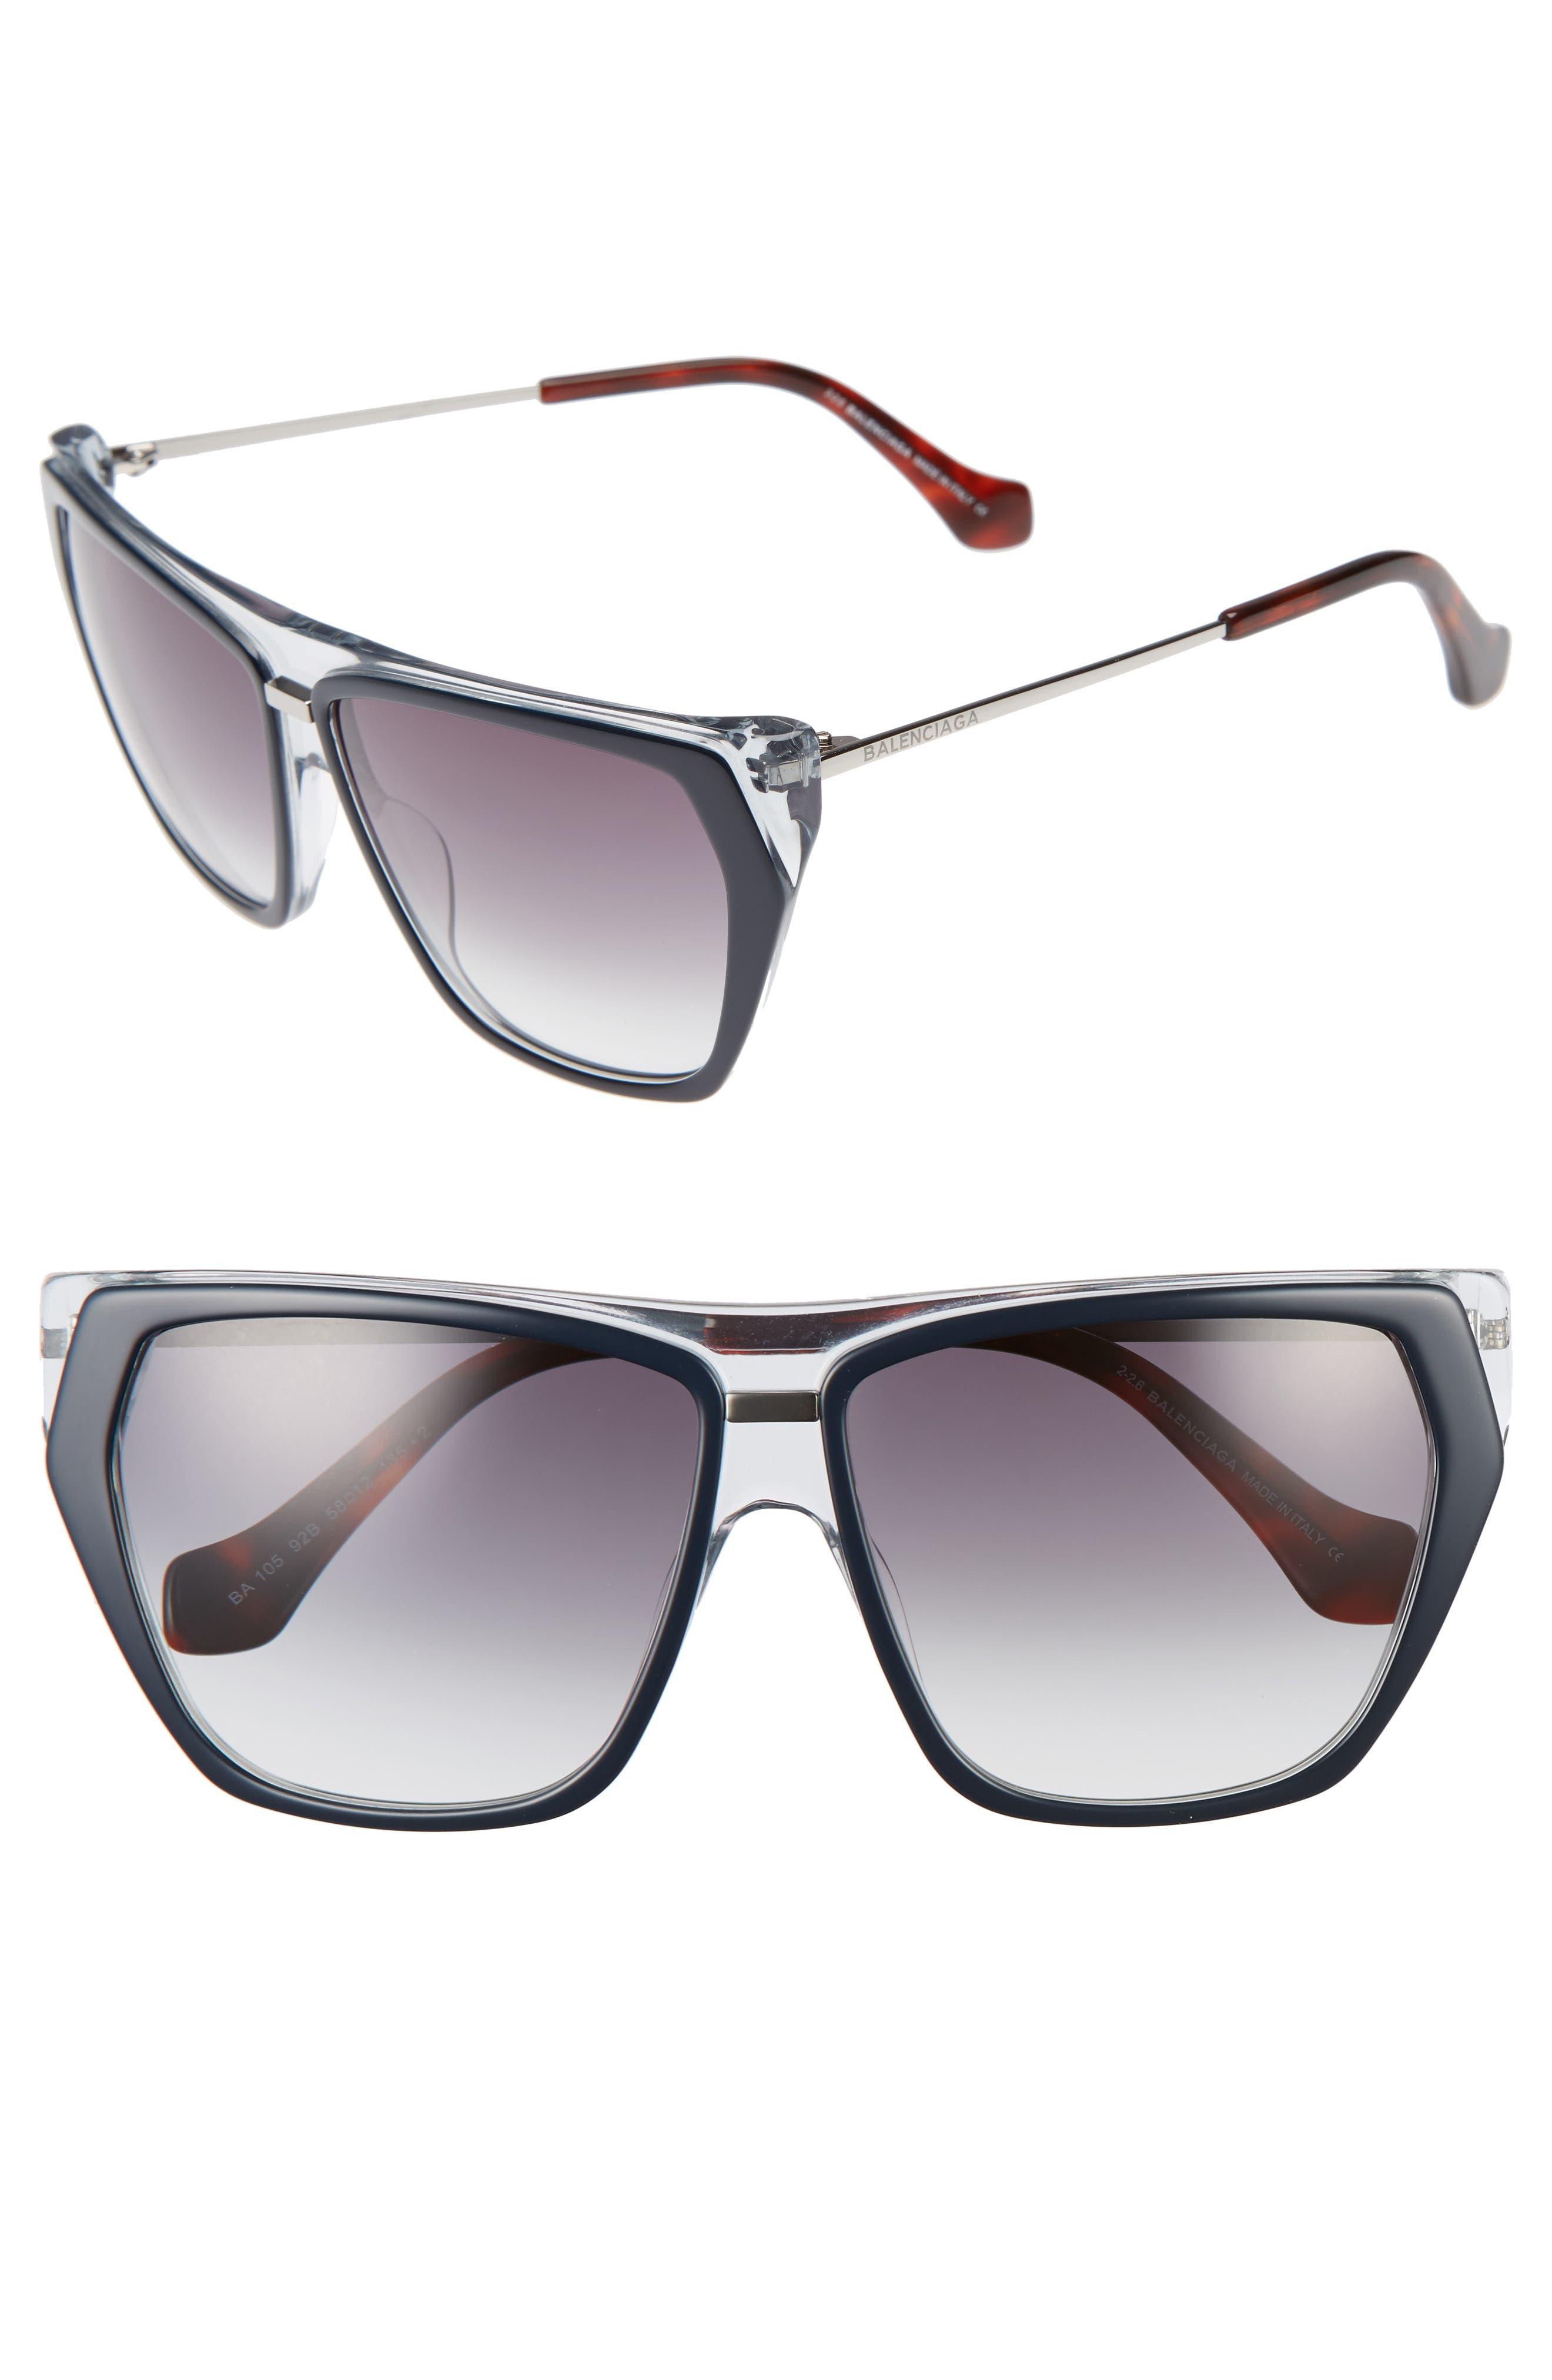 58mm Gradient Sunglasses,                             Main thumbnail 1, color,                             Blu Crys/ Havana/ Grdient Smke